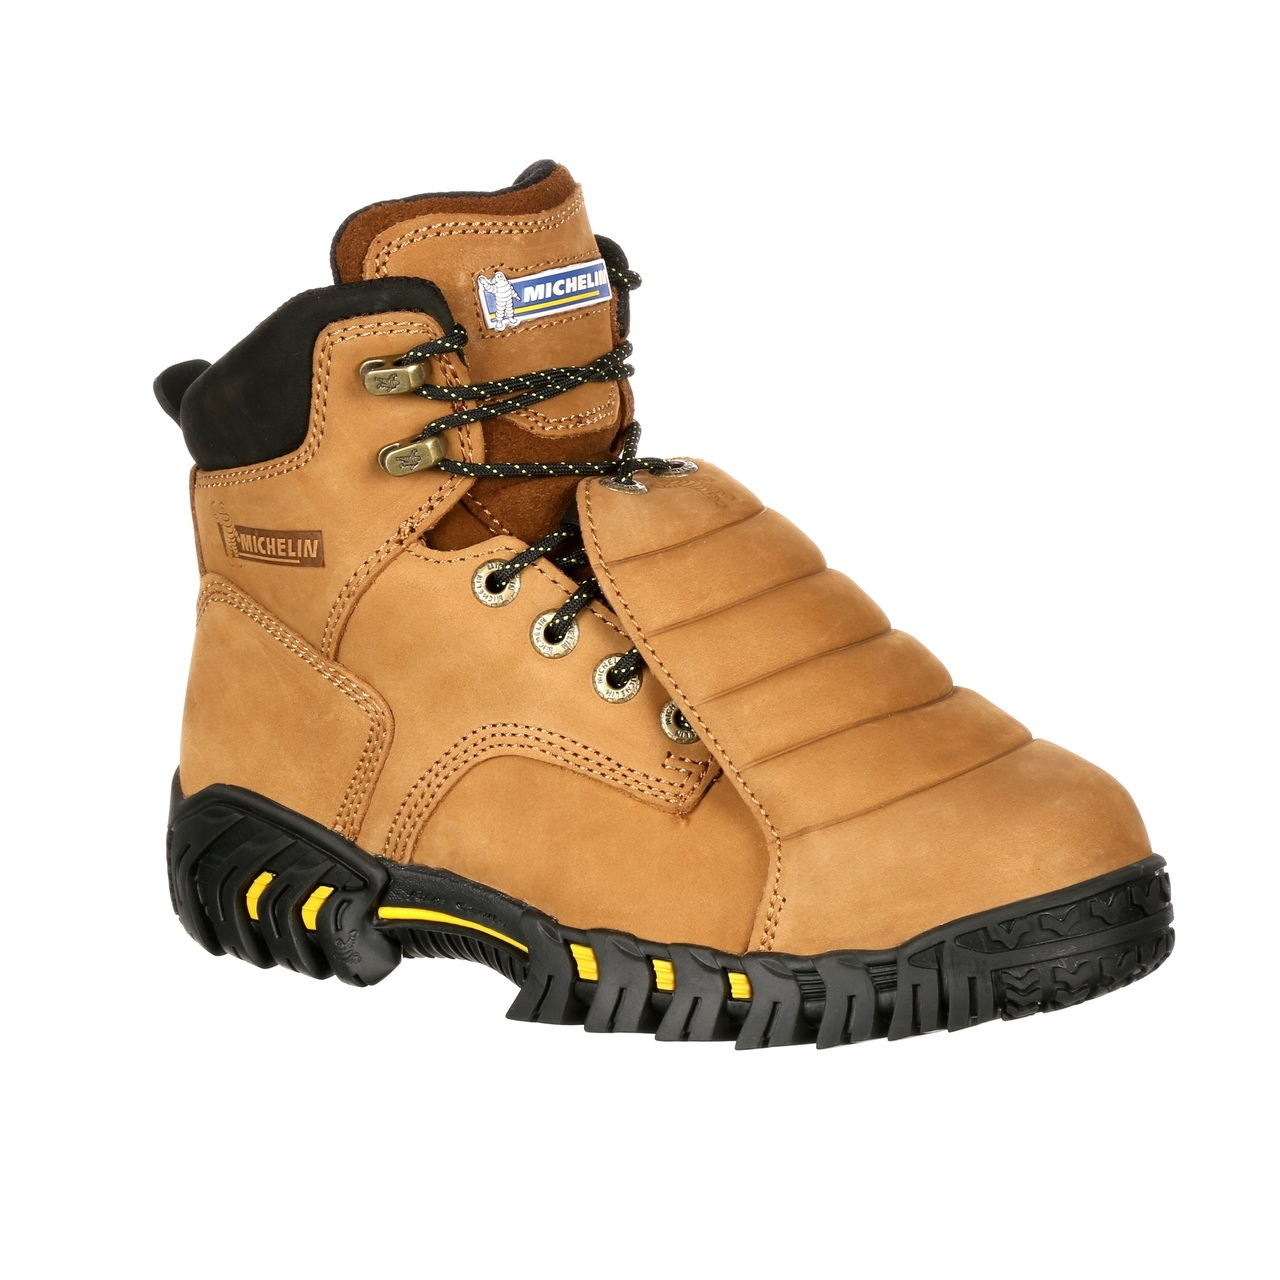 "Michelin Sledge 6"" Steel Toe Boots"